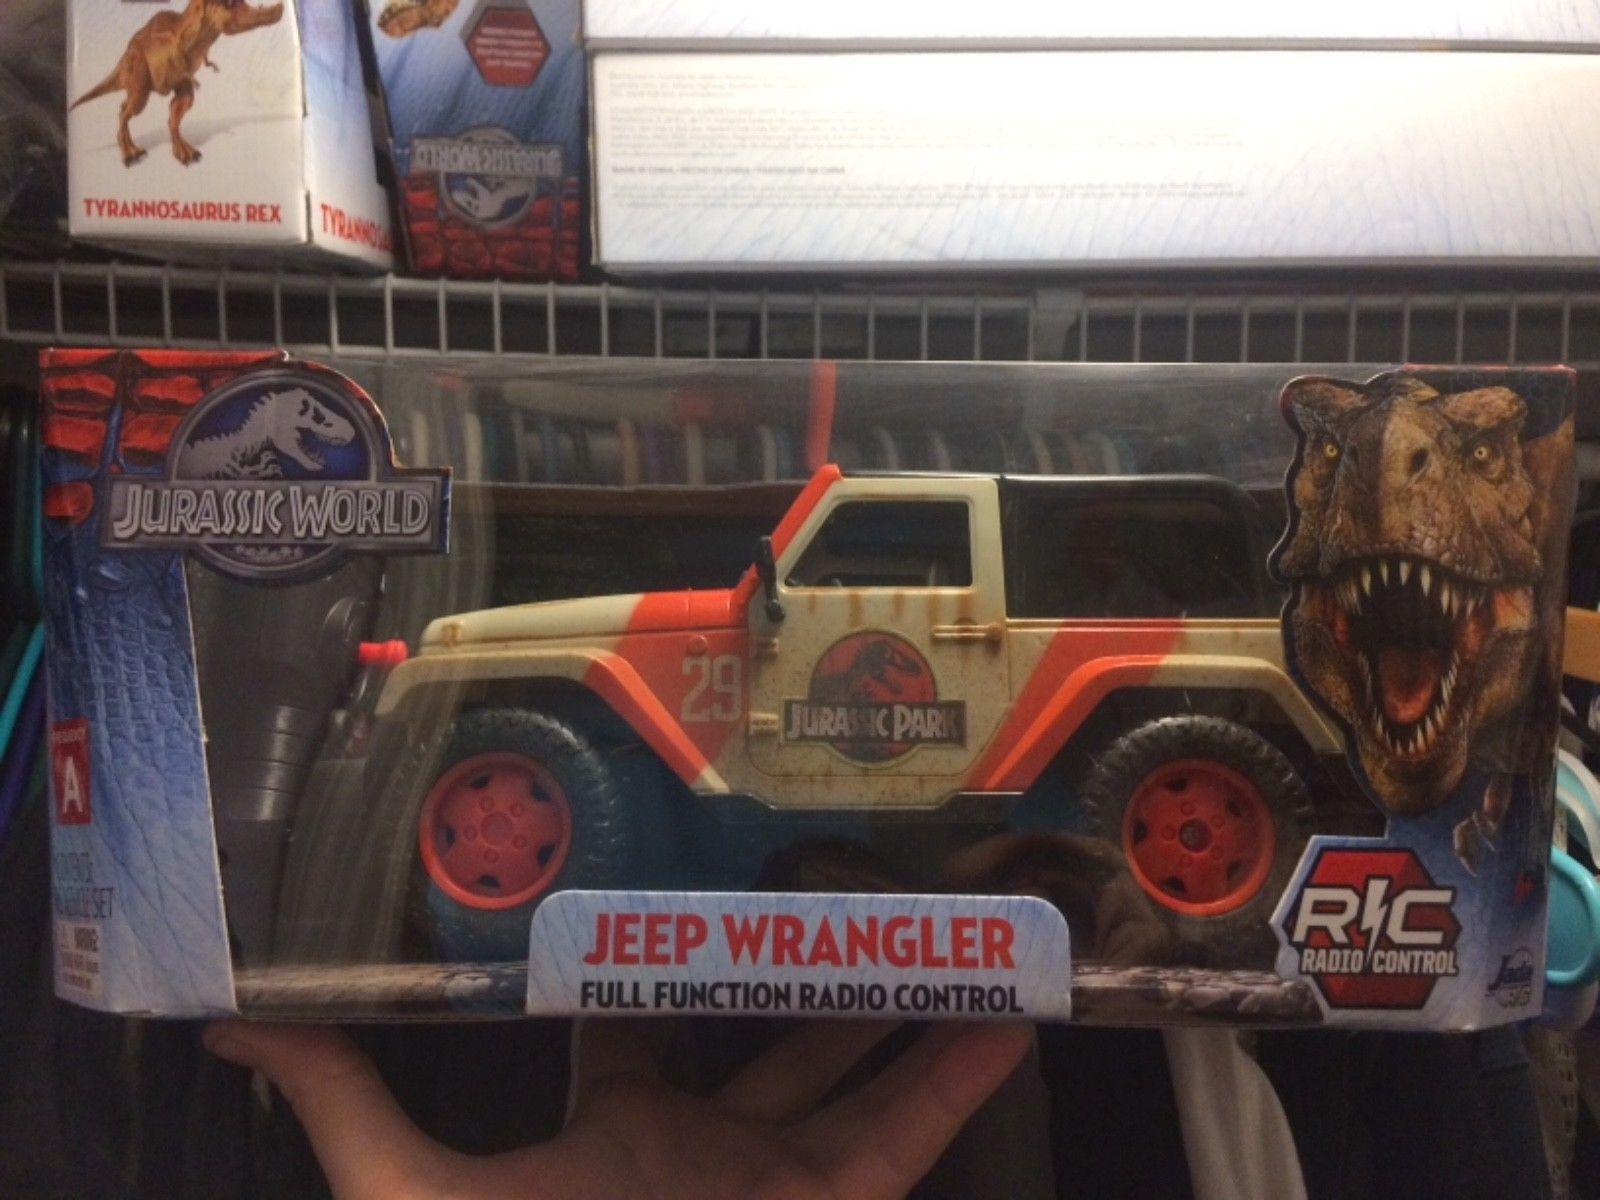 Jada car toys  Jurassic World Jeep Wrangler Remote Control Vehicle Jurassic Park